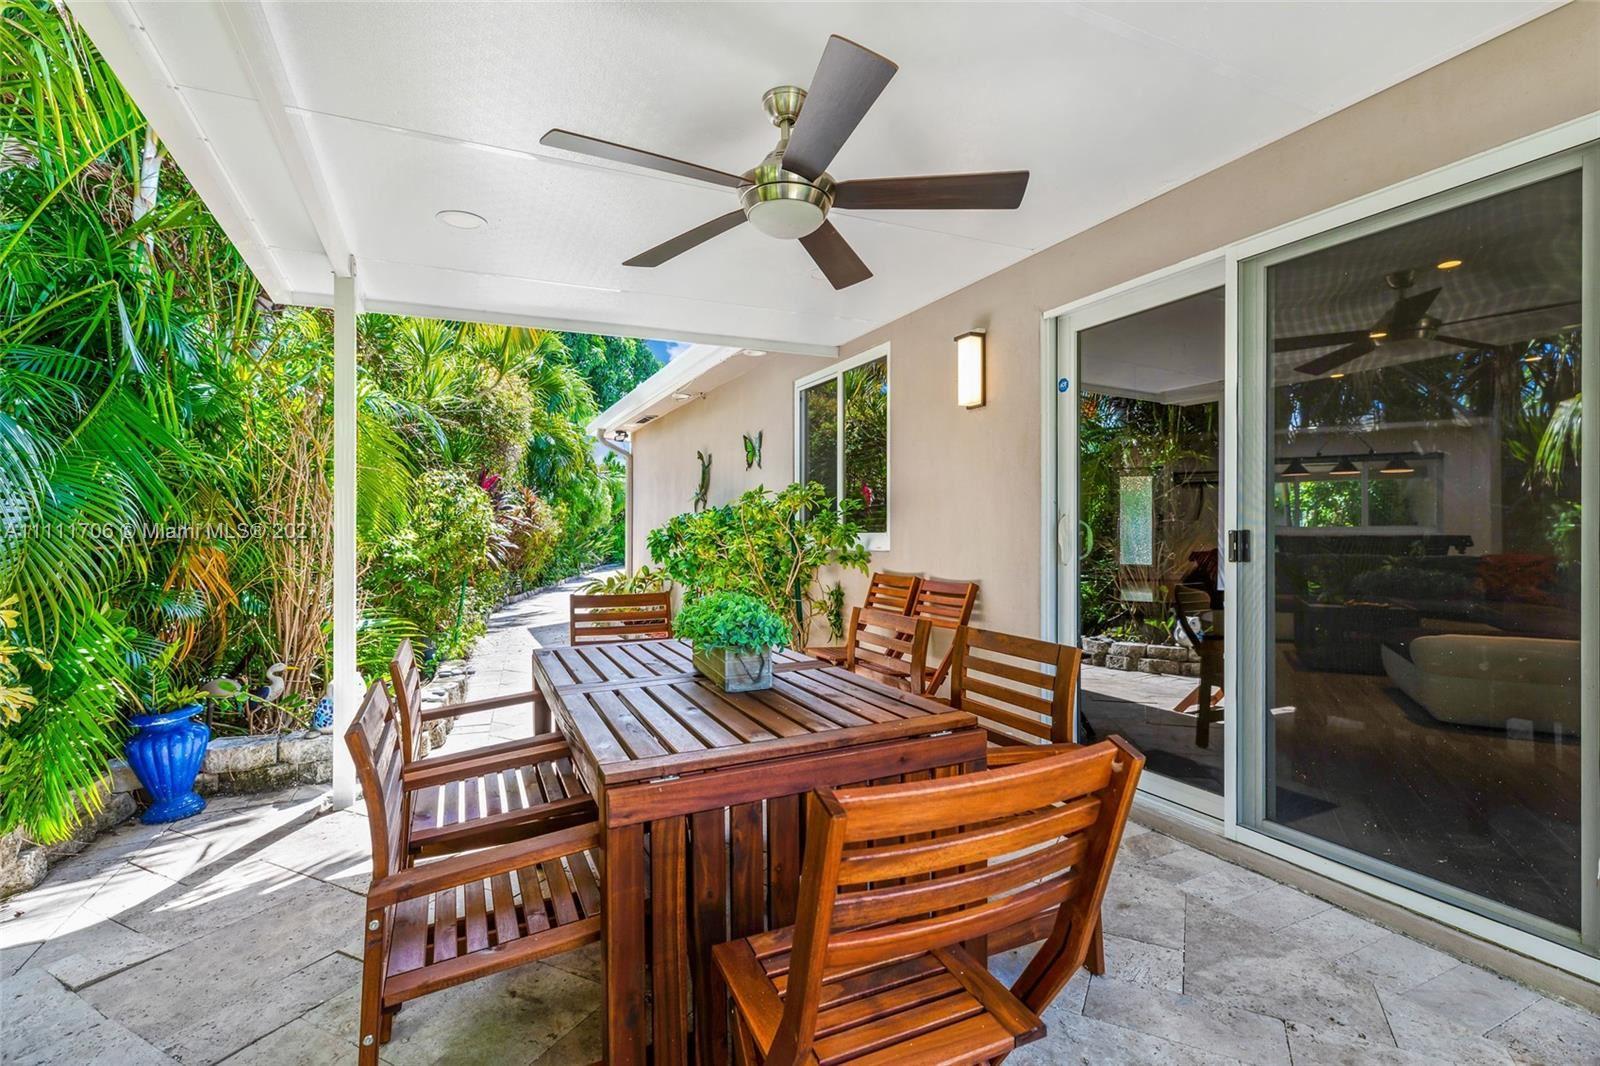 Photo of 2167 NE 58th St, Fort Lauderdale, FL 33308 (MLS # A11111706)